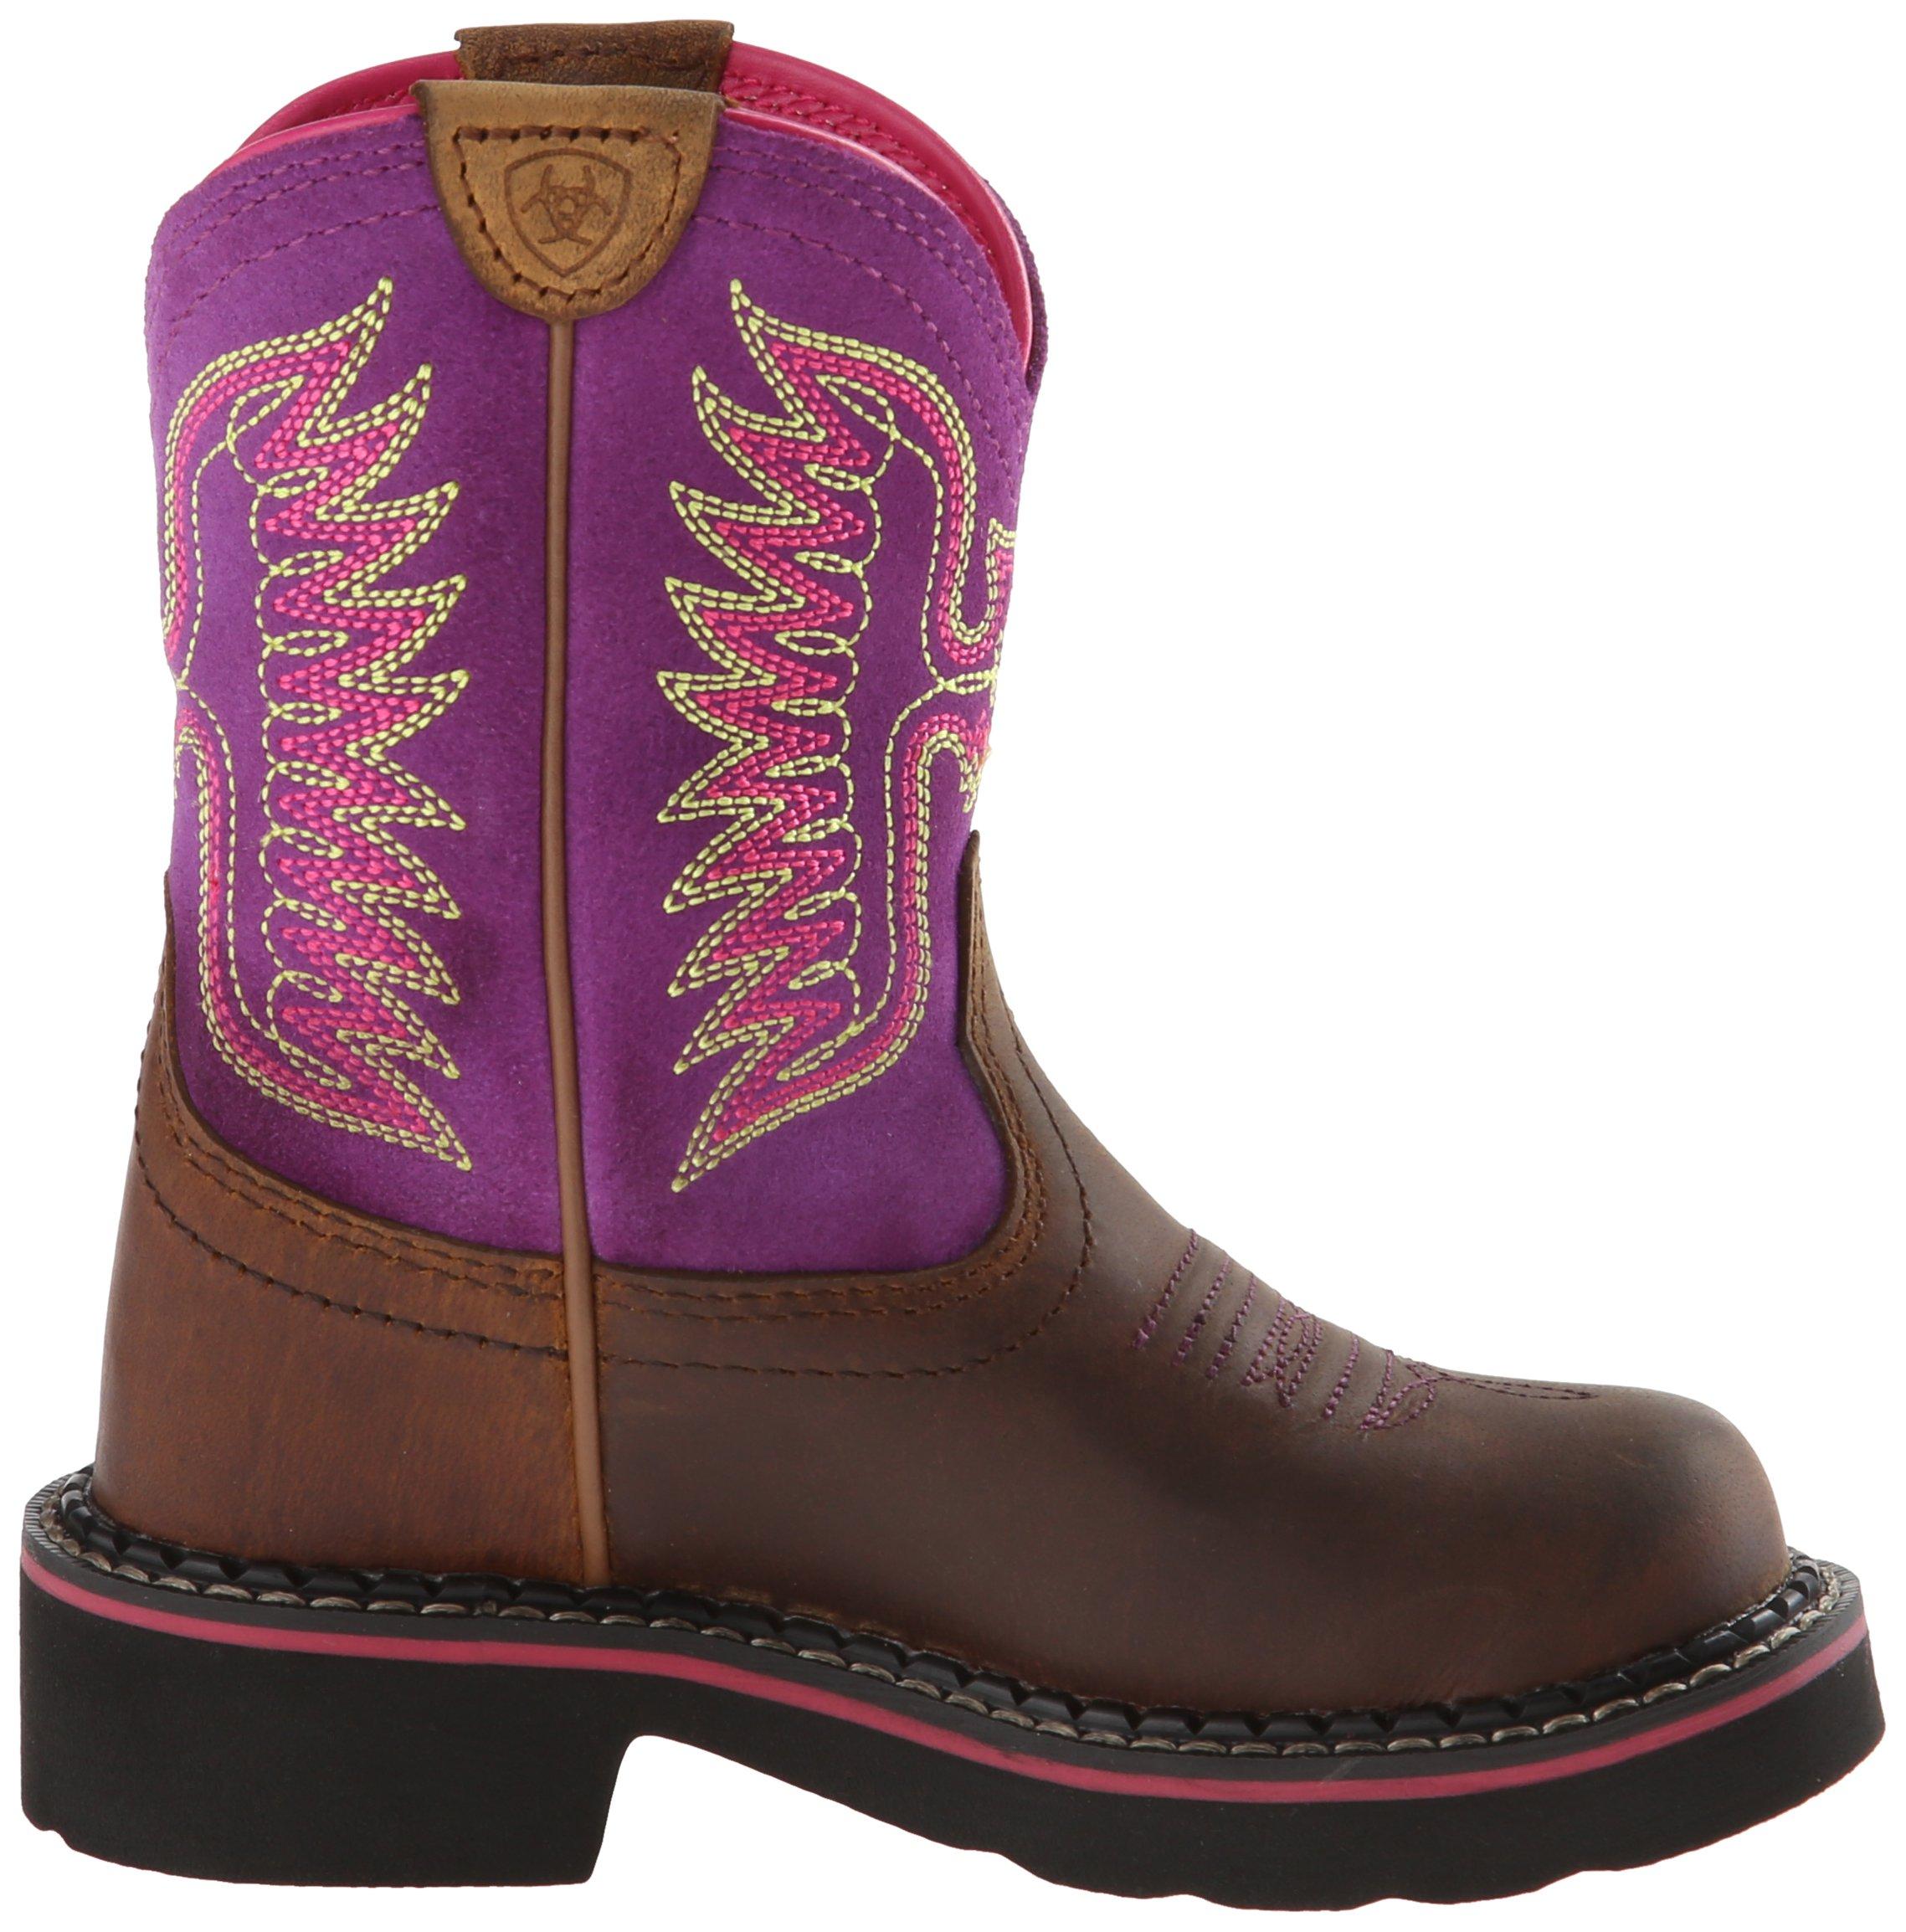 Kids' Fatbaby Thunderbird Western Cowboy Boot, Powder Brown/Amethyst, 12.5 M US Little Kid by ARIAT (Image #7)